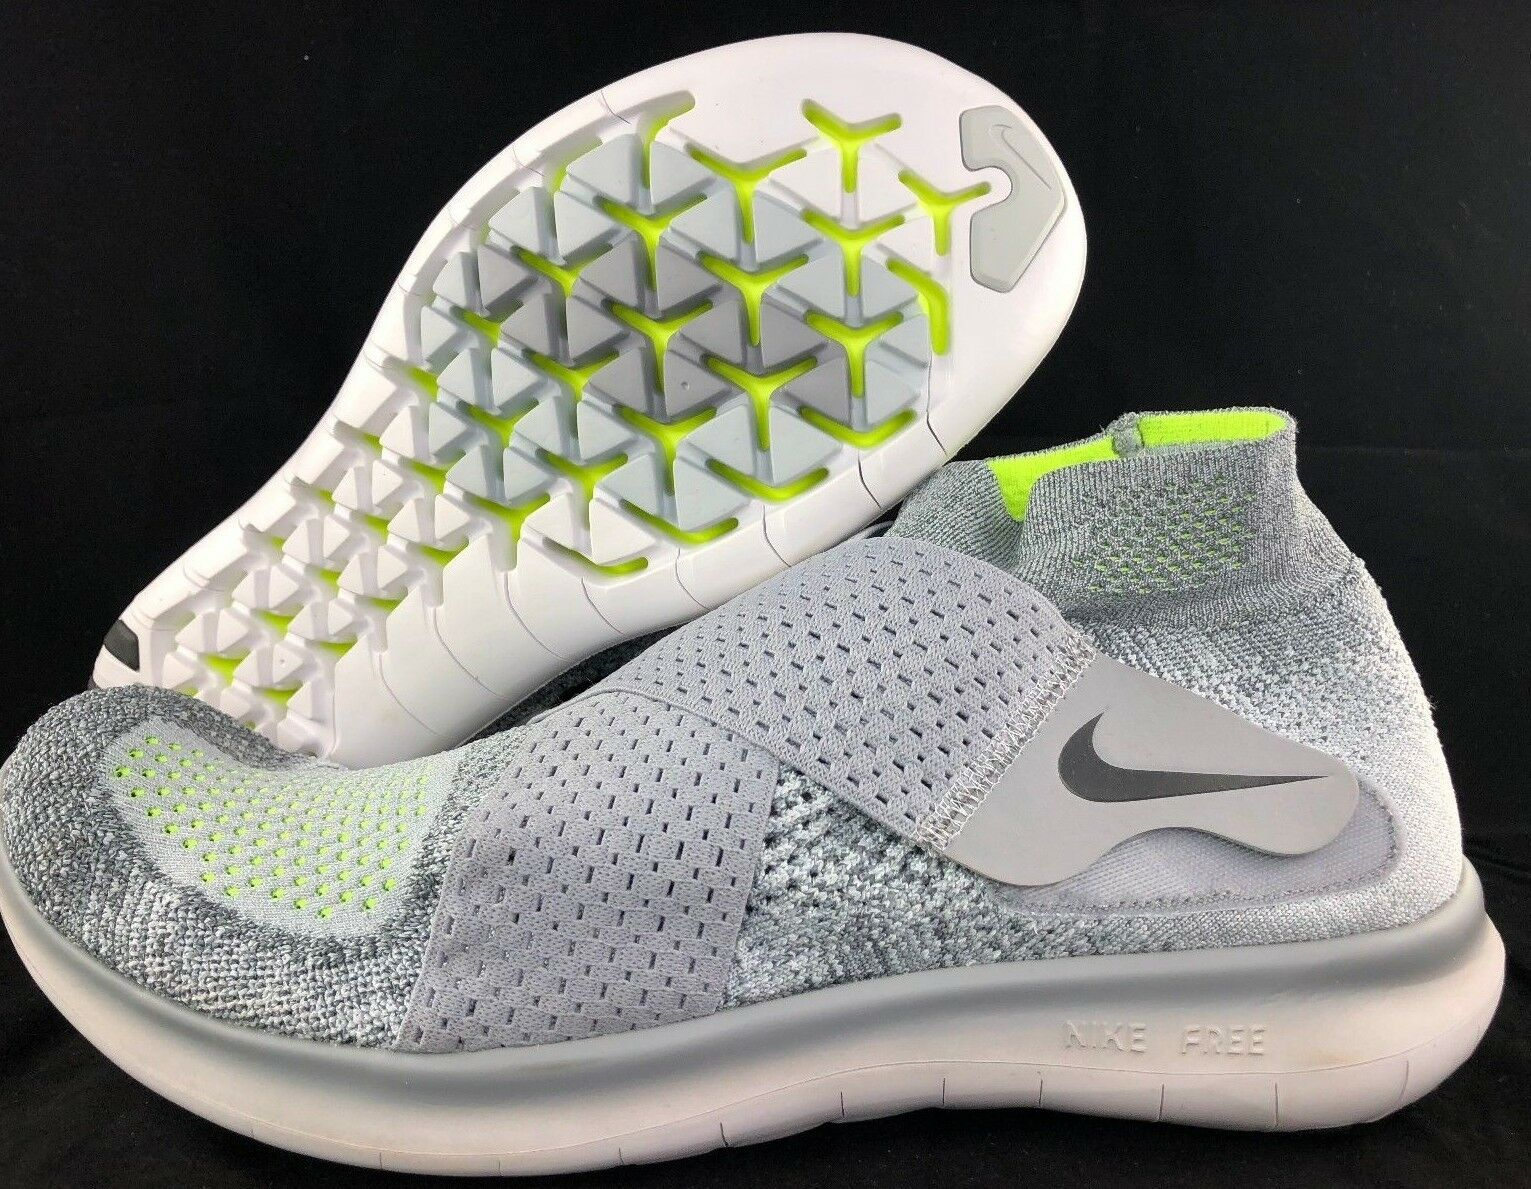 Nike Free RN Run Motion FK Flyknit 2018 Grey Black White 880845-002 Men's 9.5-13